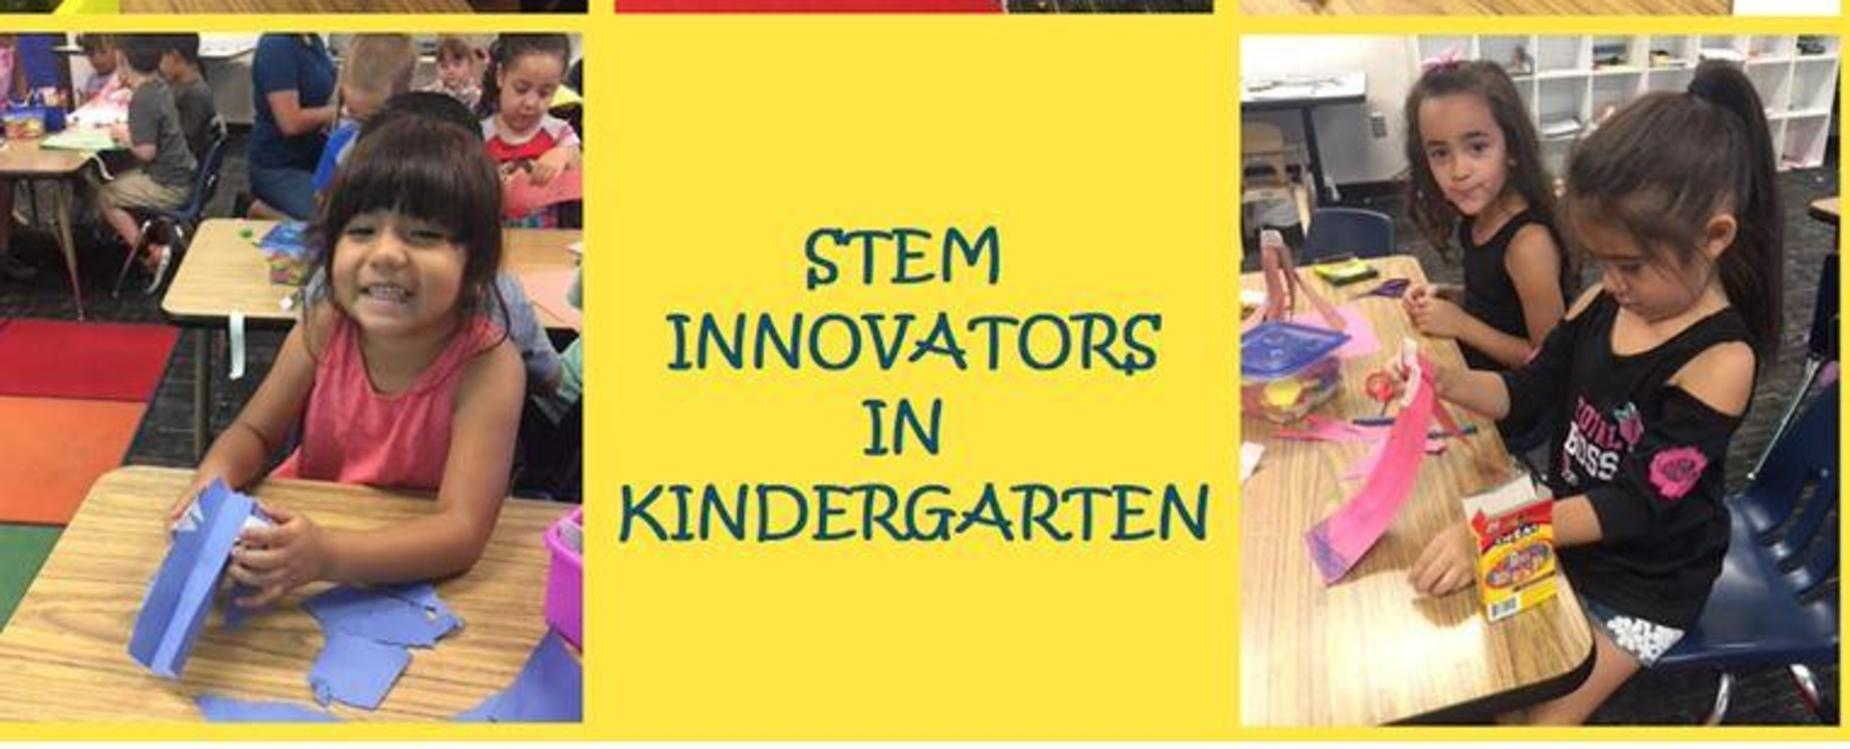 STEM Innovators